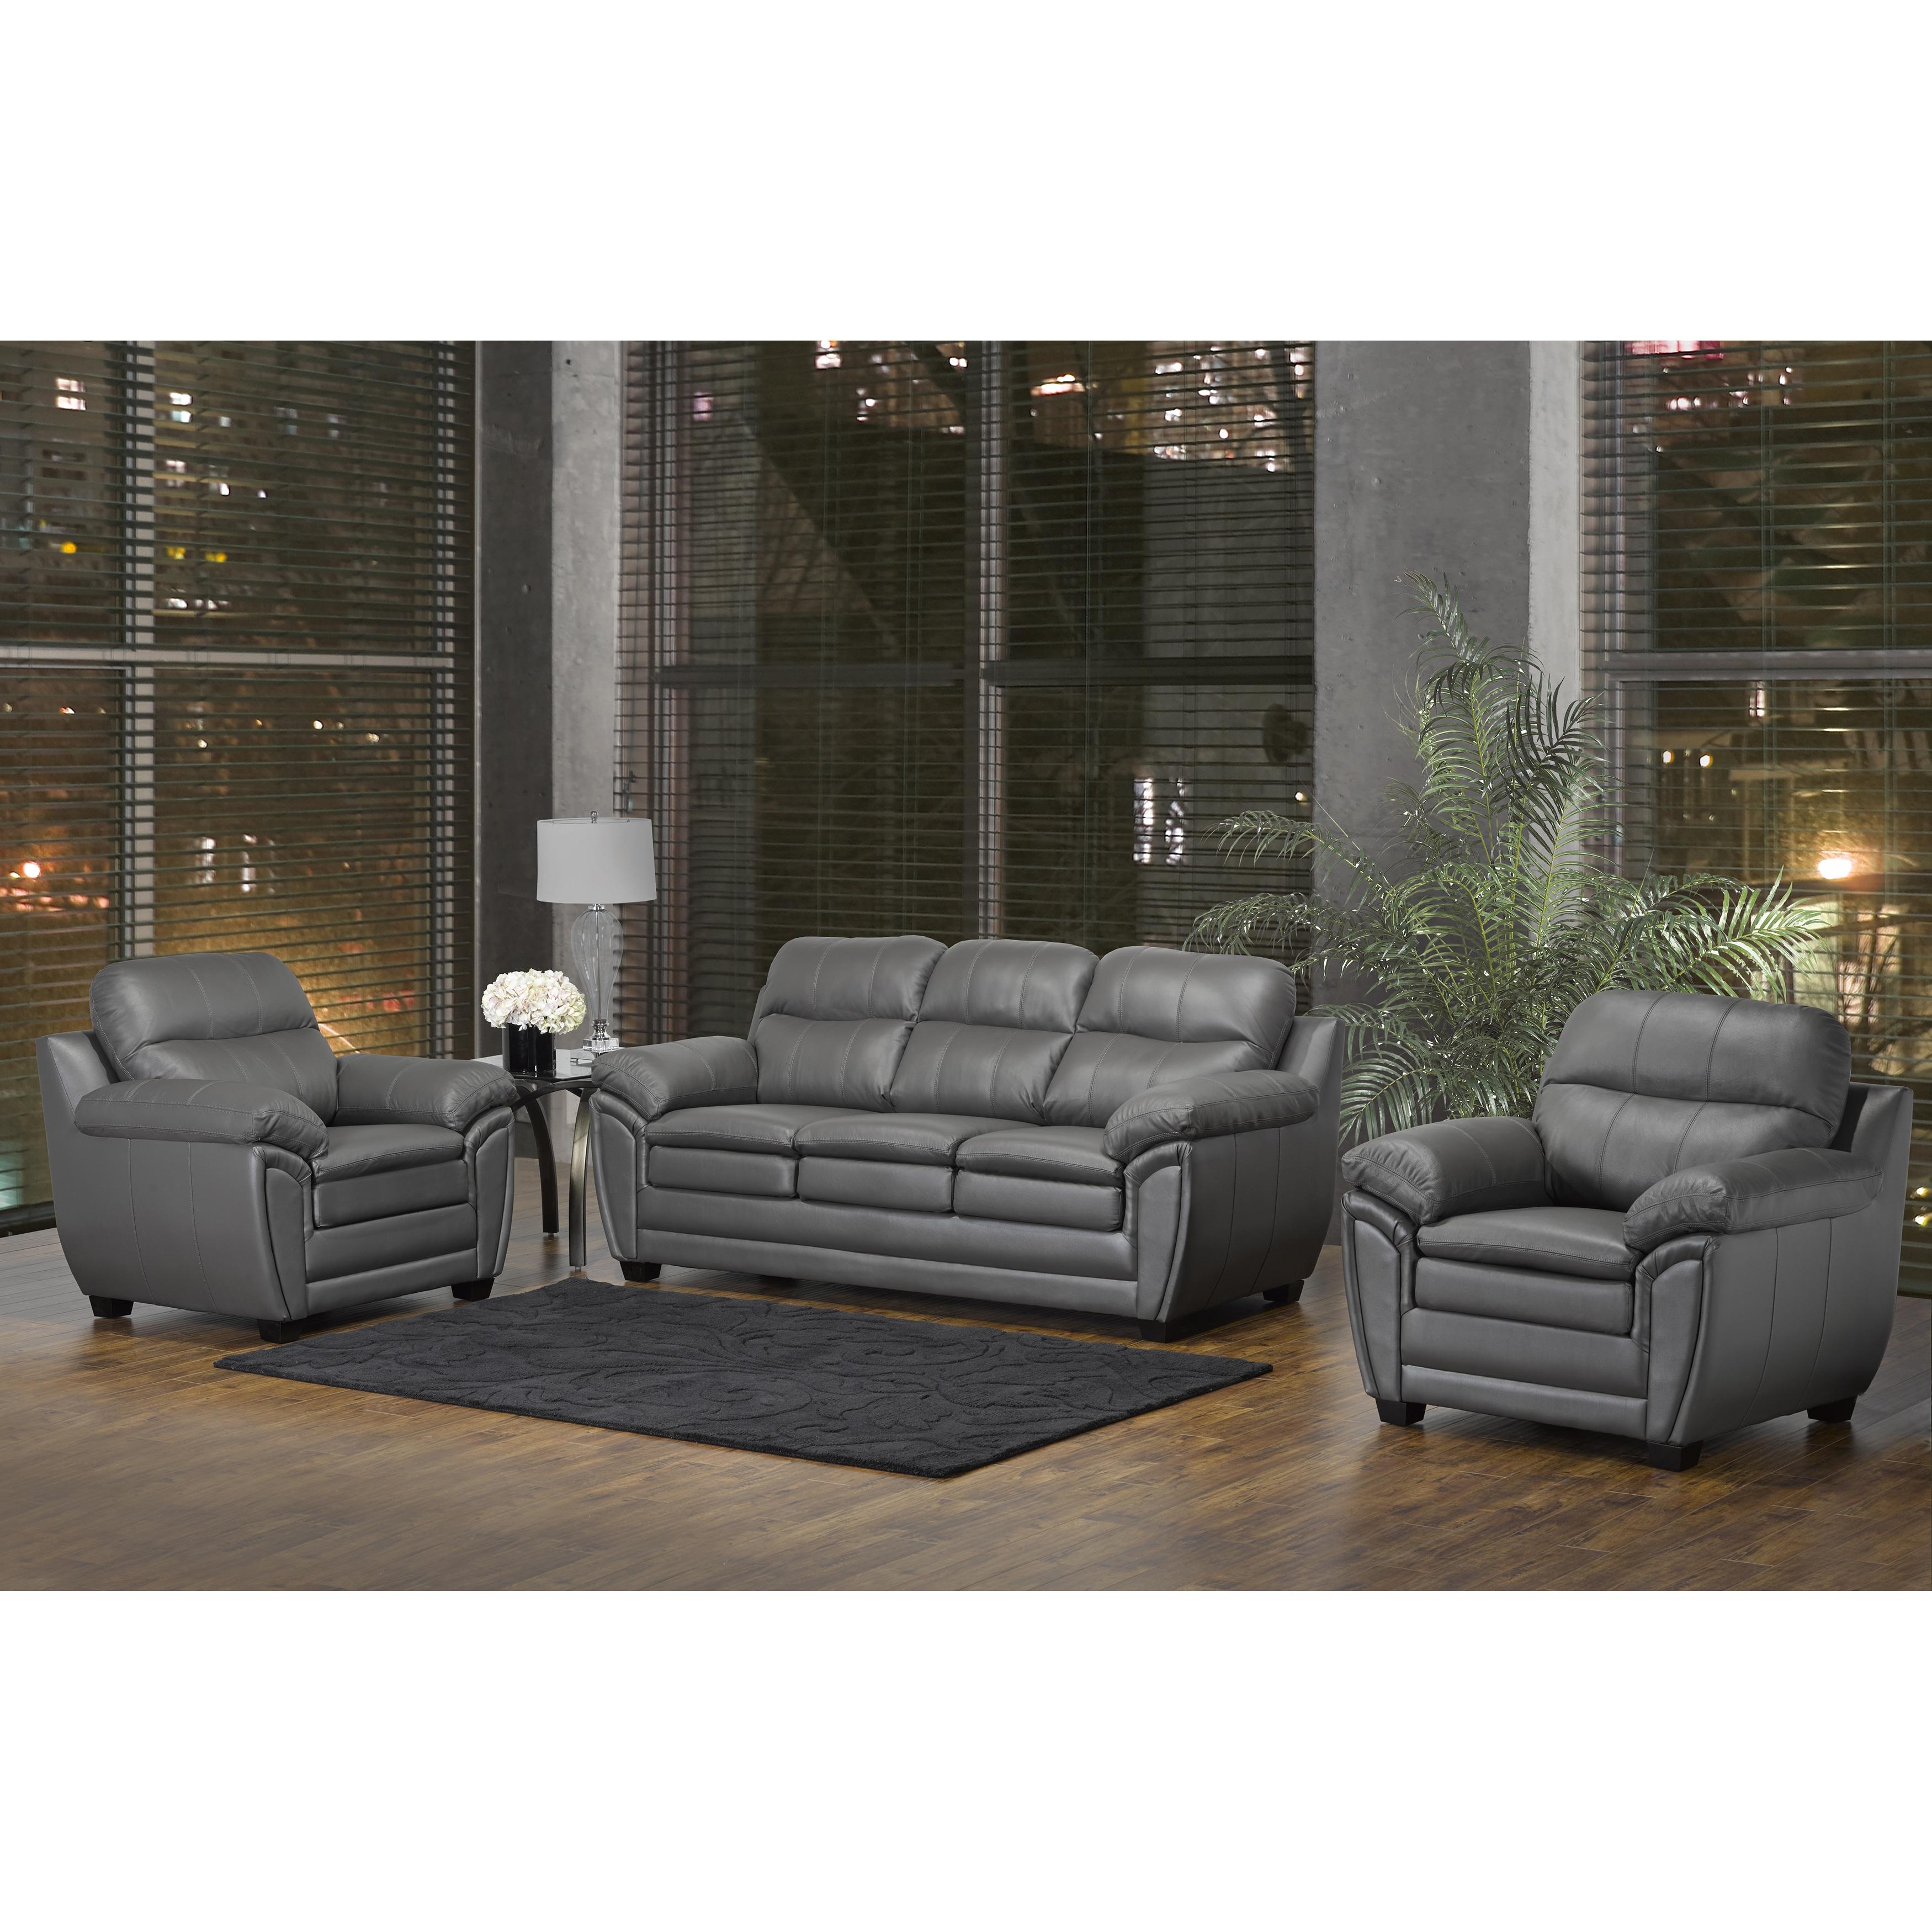 Marcus Premium Grey Top Grain Leather Sofa And Two Chairs Free  ~ Leather Sofa And Two Chairs